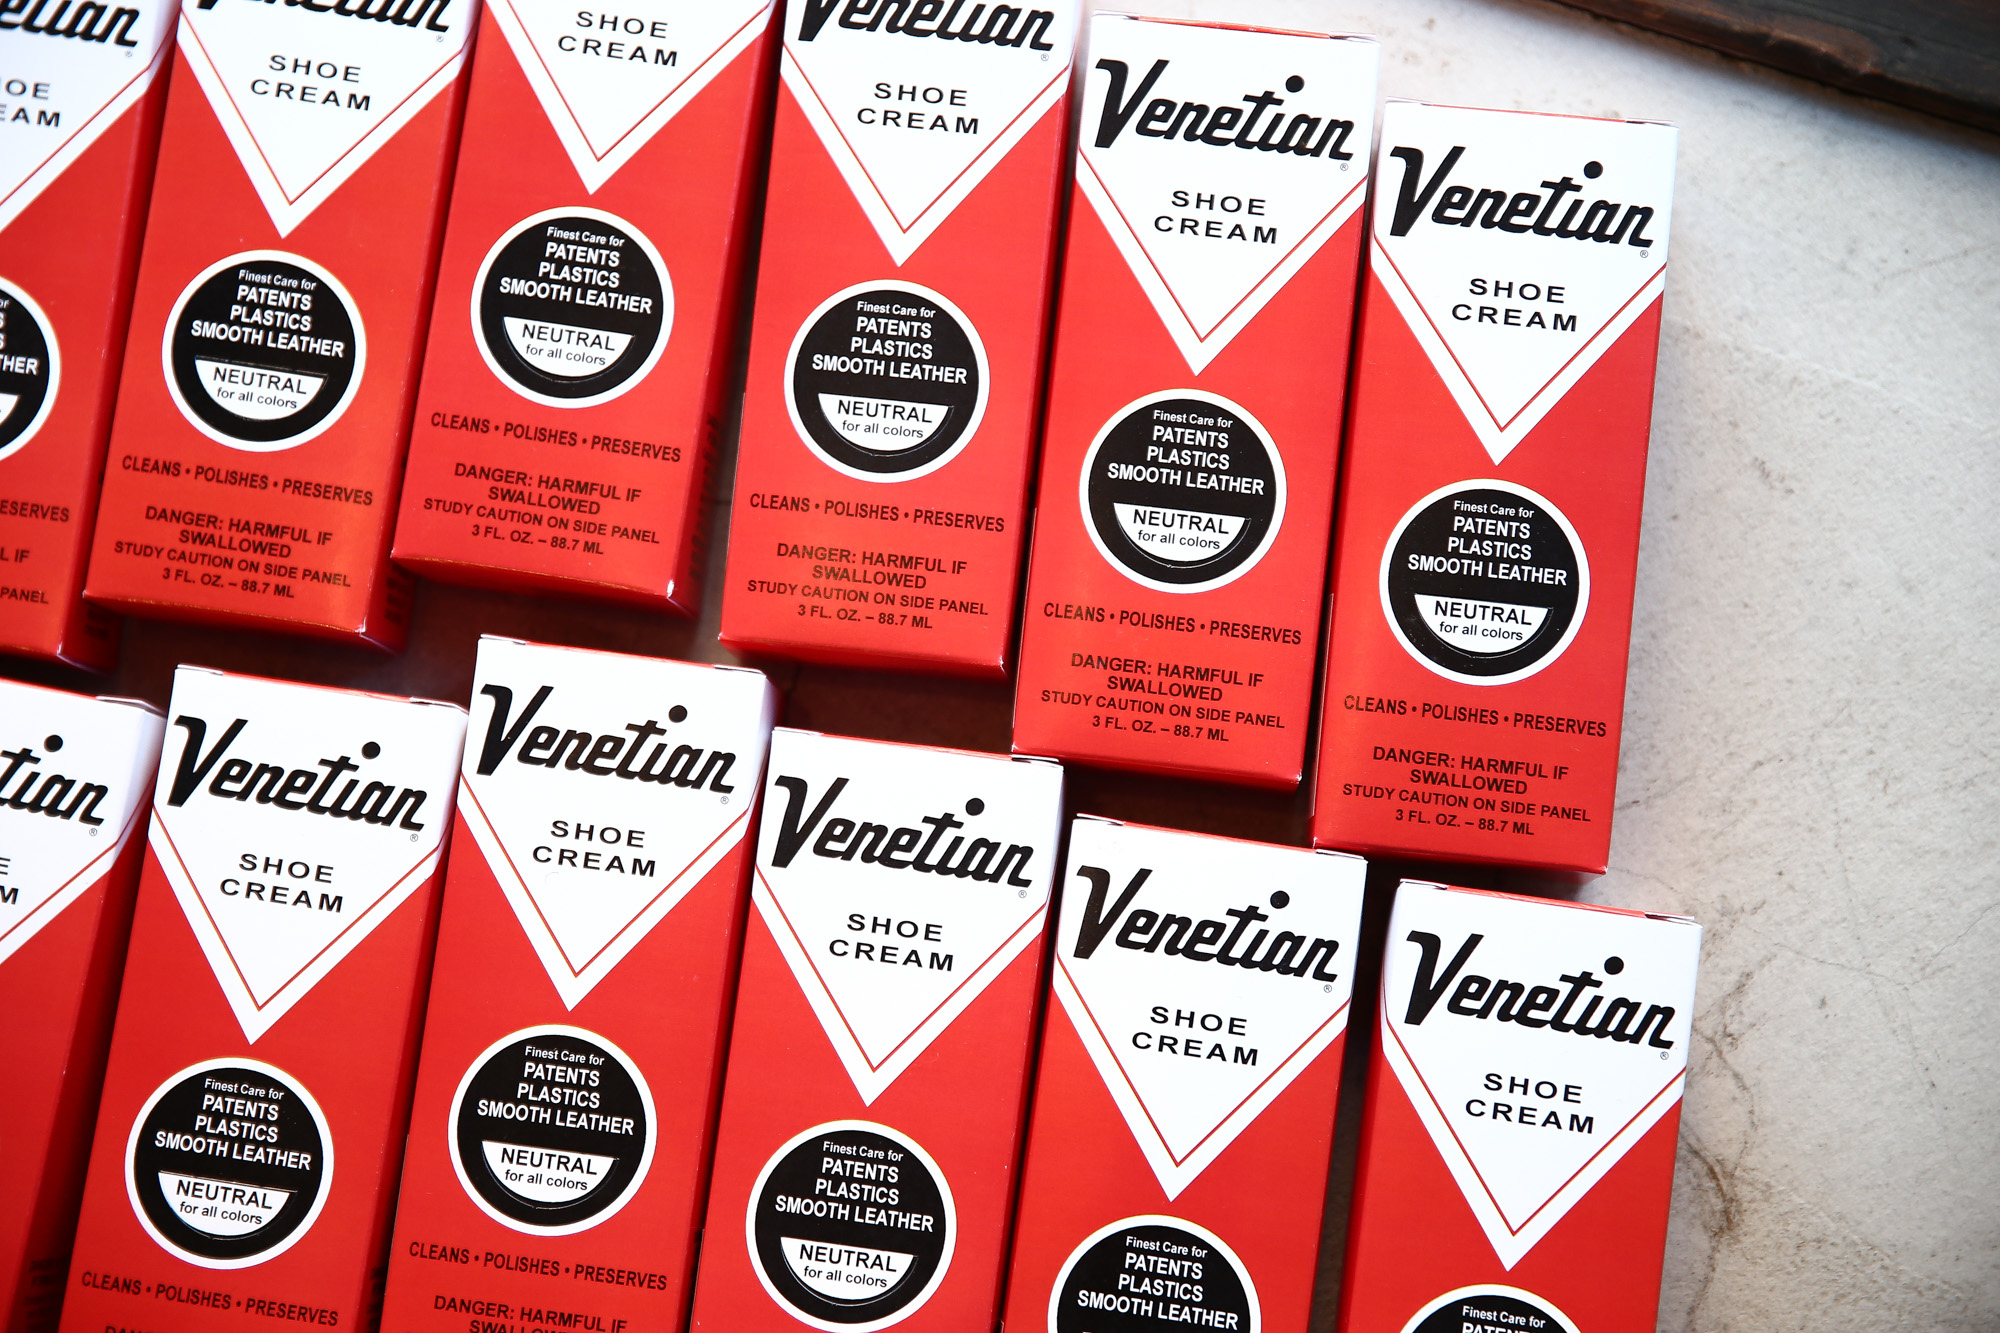 VENETIAN CREAM(ベネチアンクリーム) VENETIAN SHOE CREAM(ベネチアンシュークリーム) 3oz (74ml) 乳化性クリーム シューケア シュークリーム NEUTRAL(ニュートラル・無色) MADE IN USA(アメリカ製) venetiancream ベネチアンクリーム コードバン 愛知 名古屋 ZODIAC ゾディアック